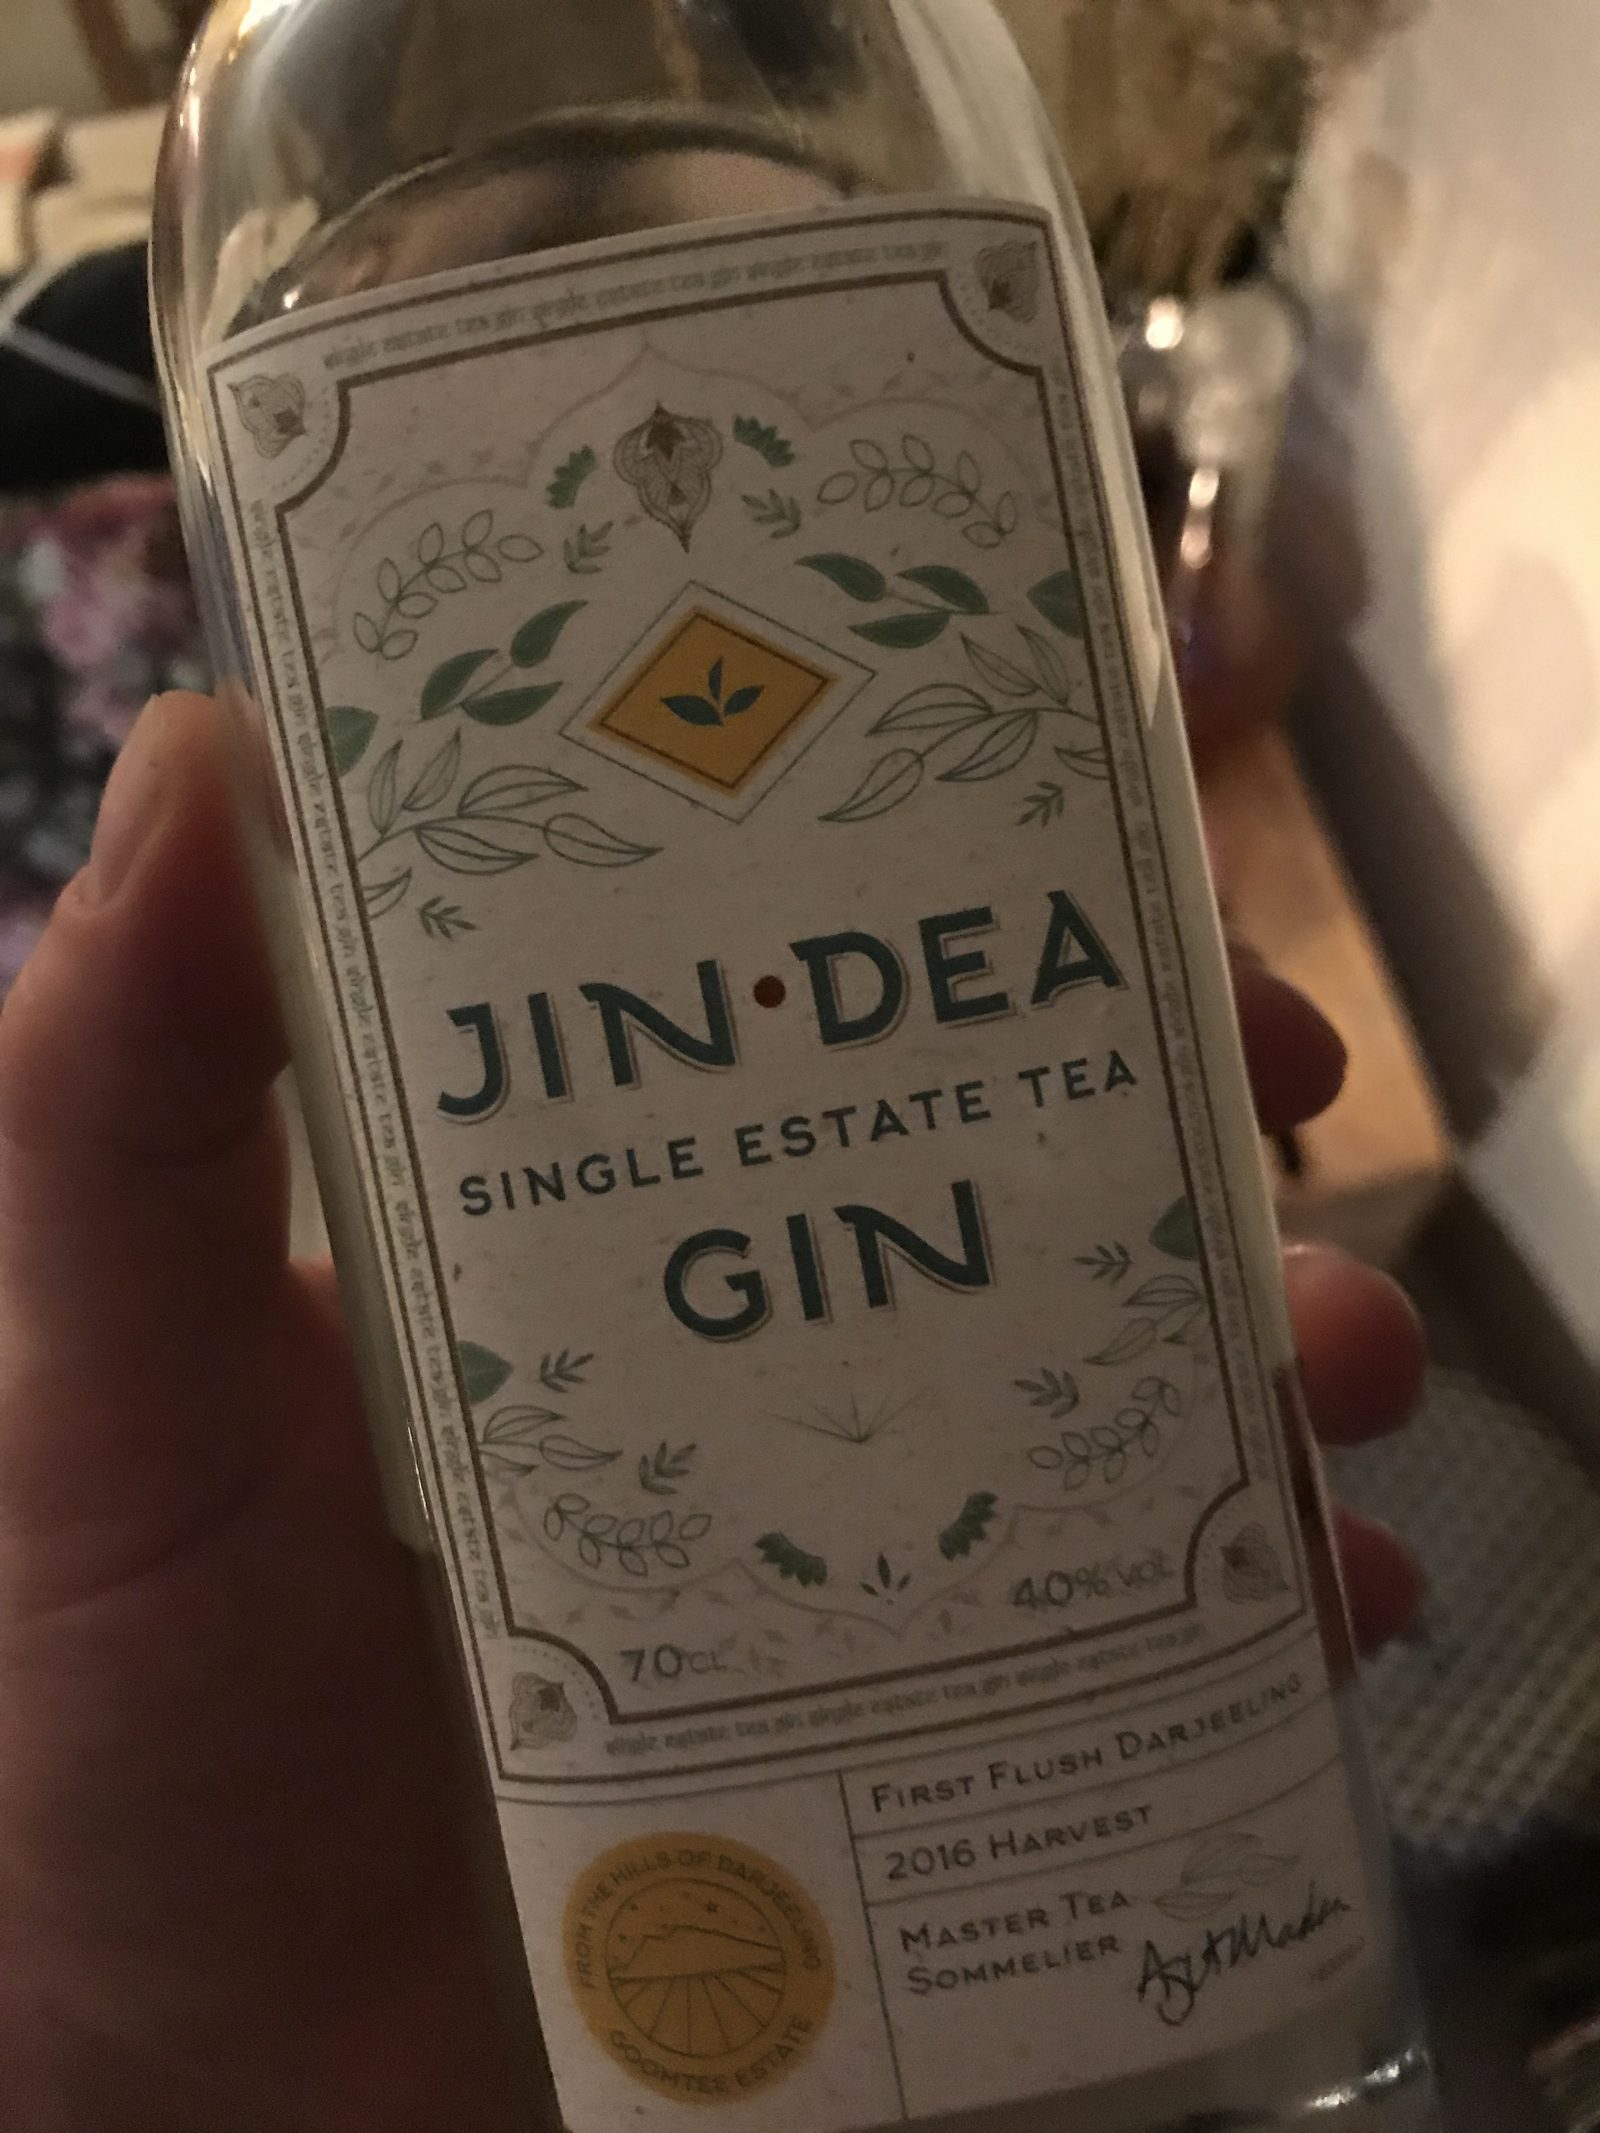 Jindea Darjeeling Tea Gin